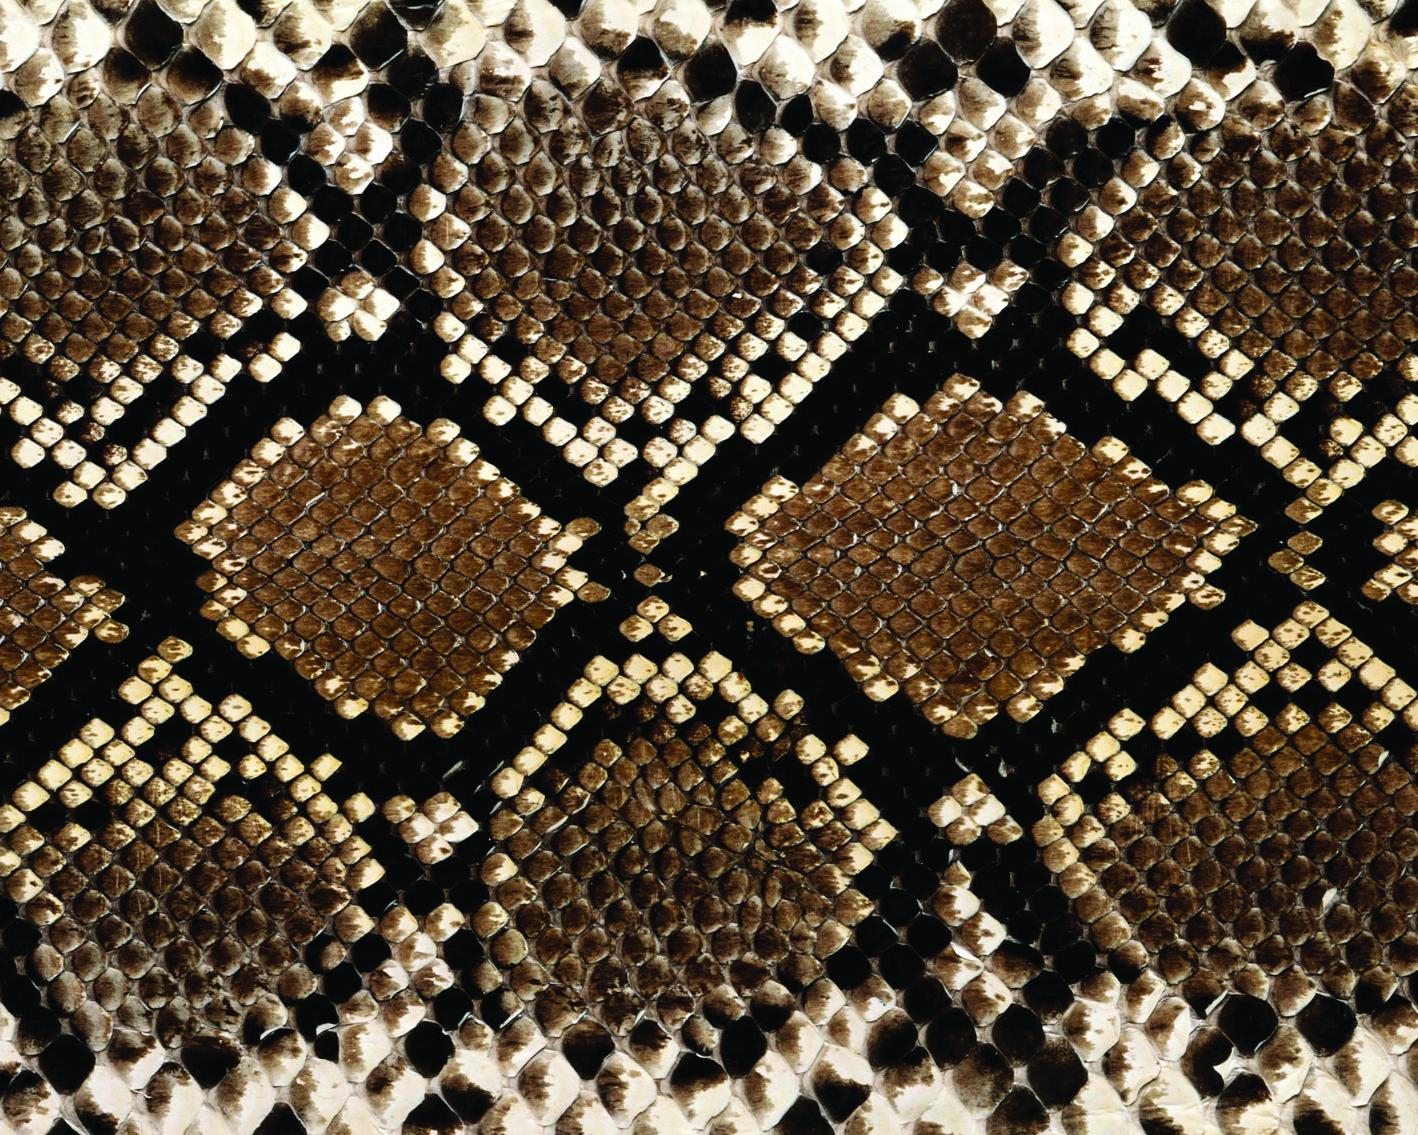 snake skins-19